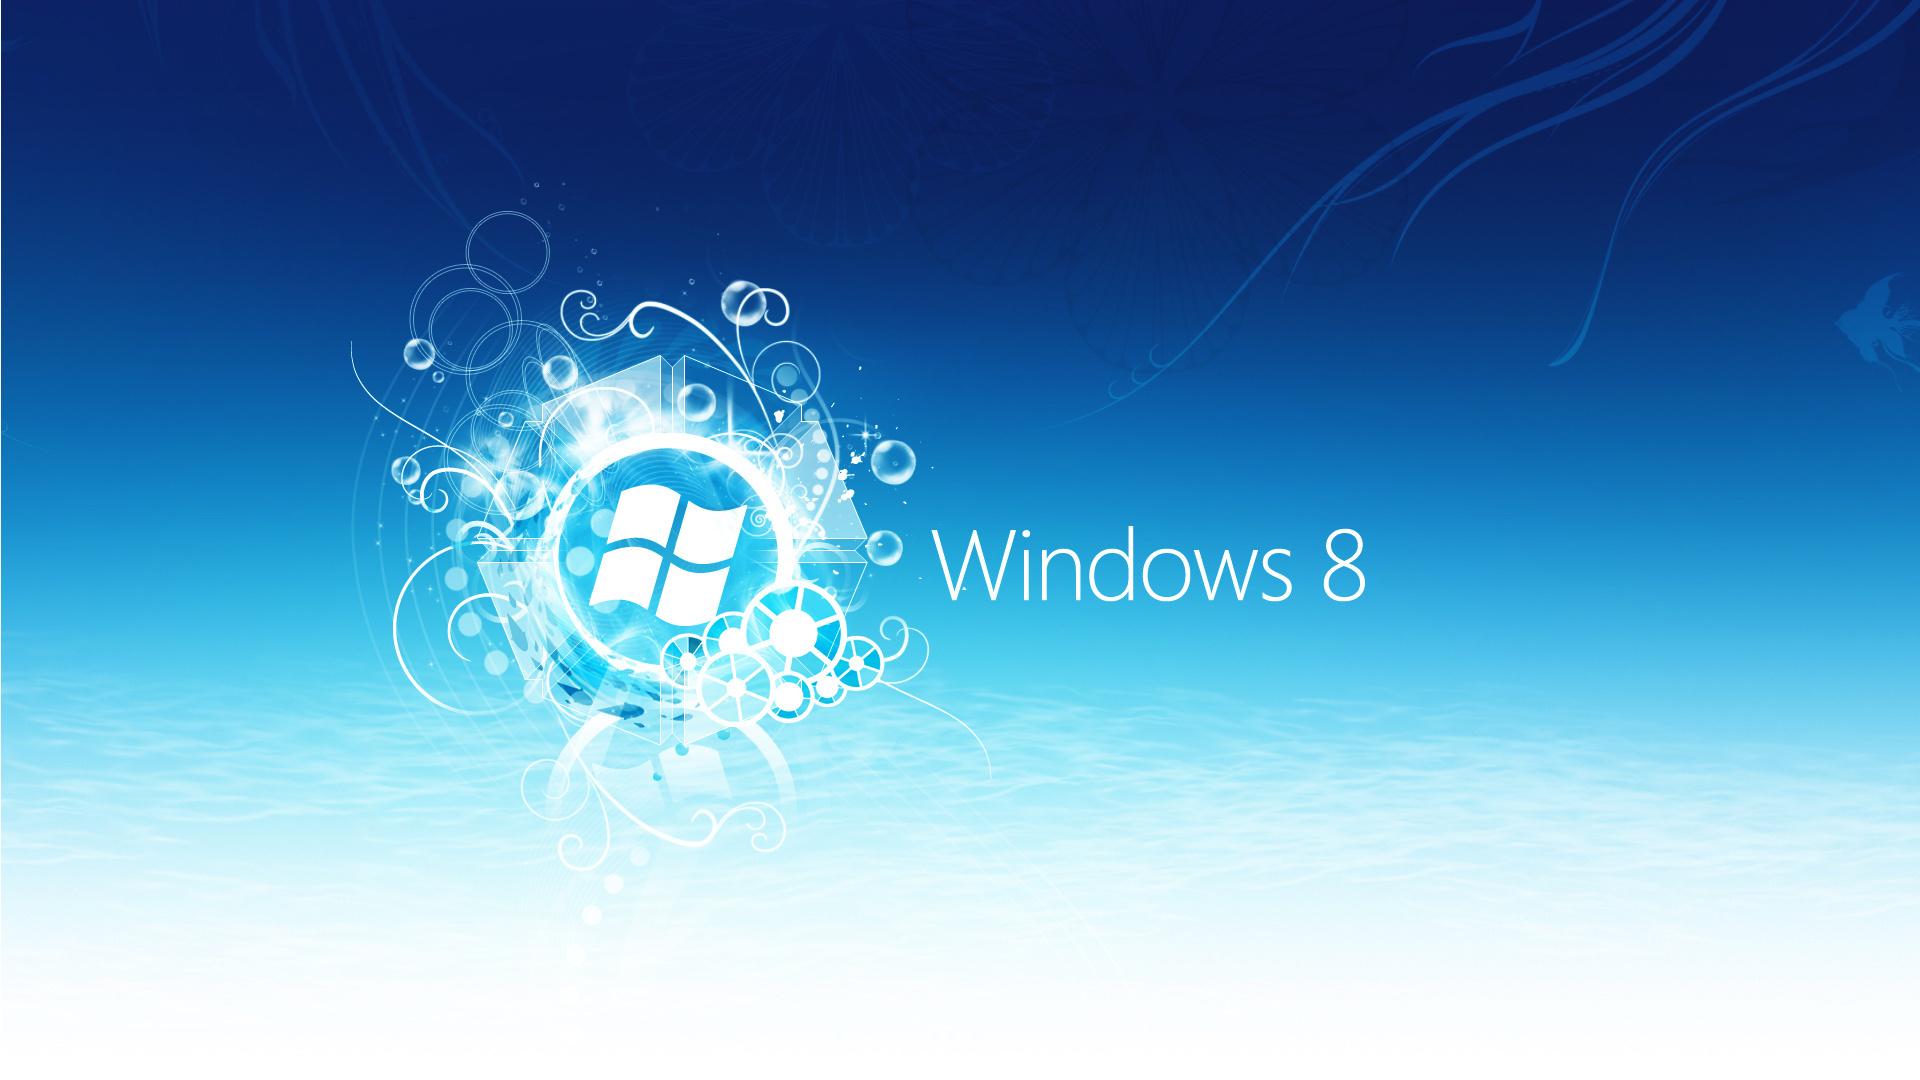 Wallpaper Windows 8  № 1929000 загрузить